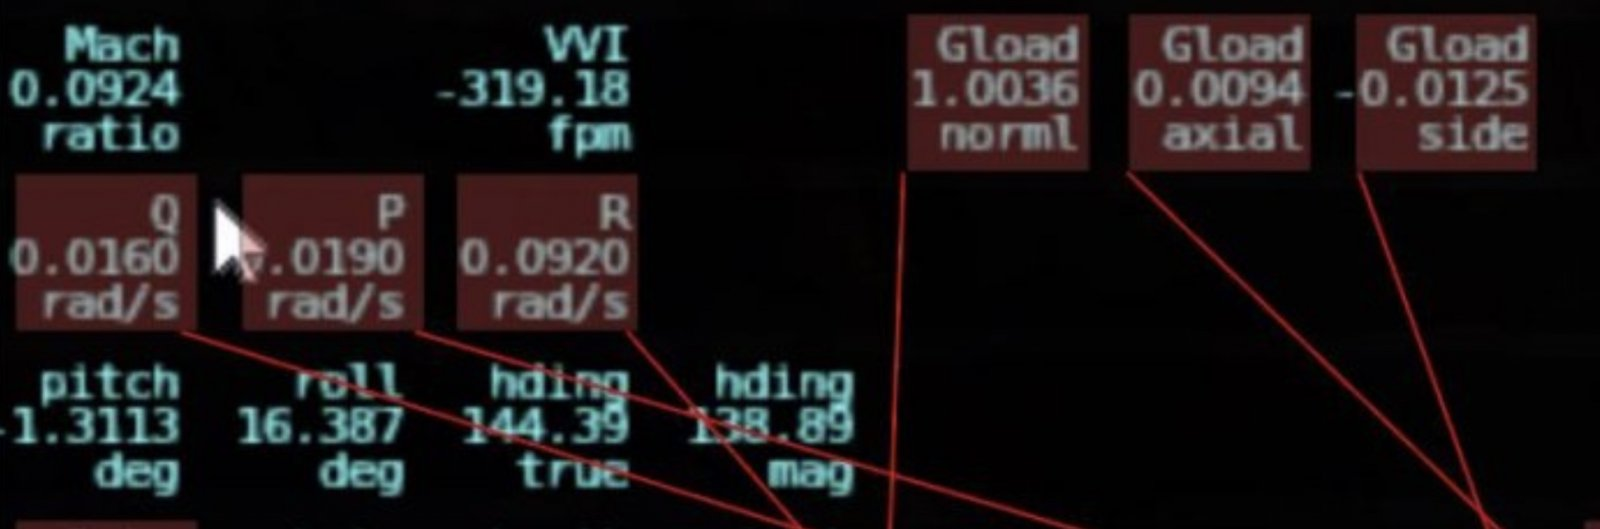 948B972F-C21E-4A3E-B41E-A186BE58C10F.jpeg